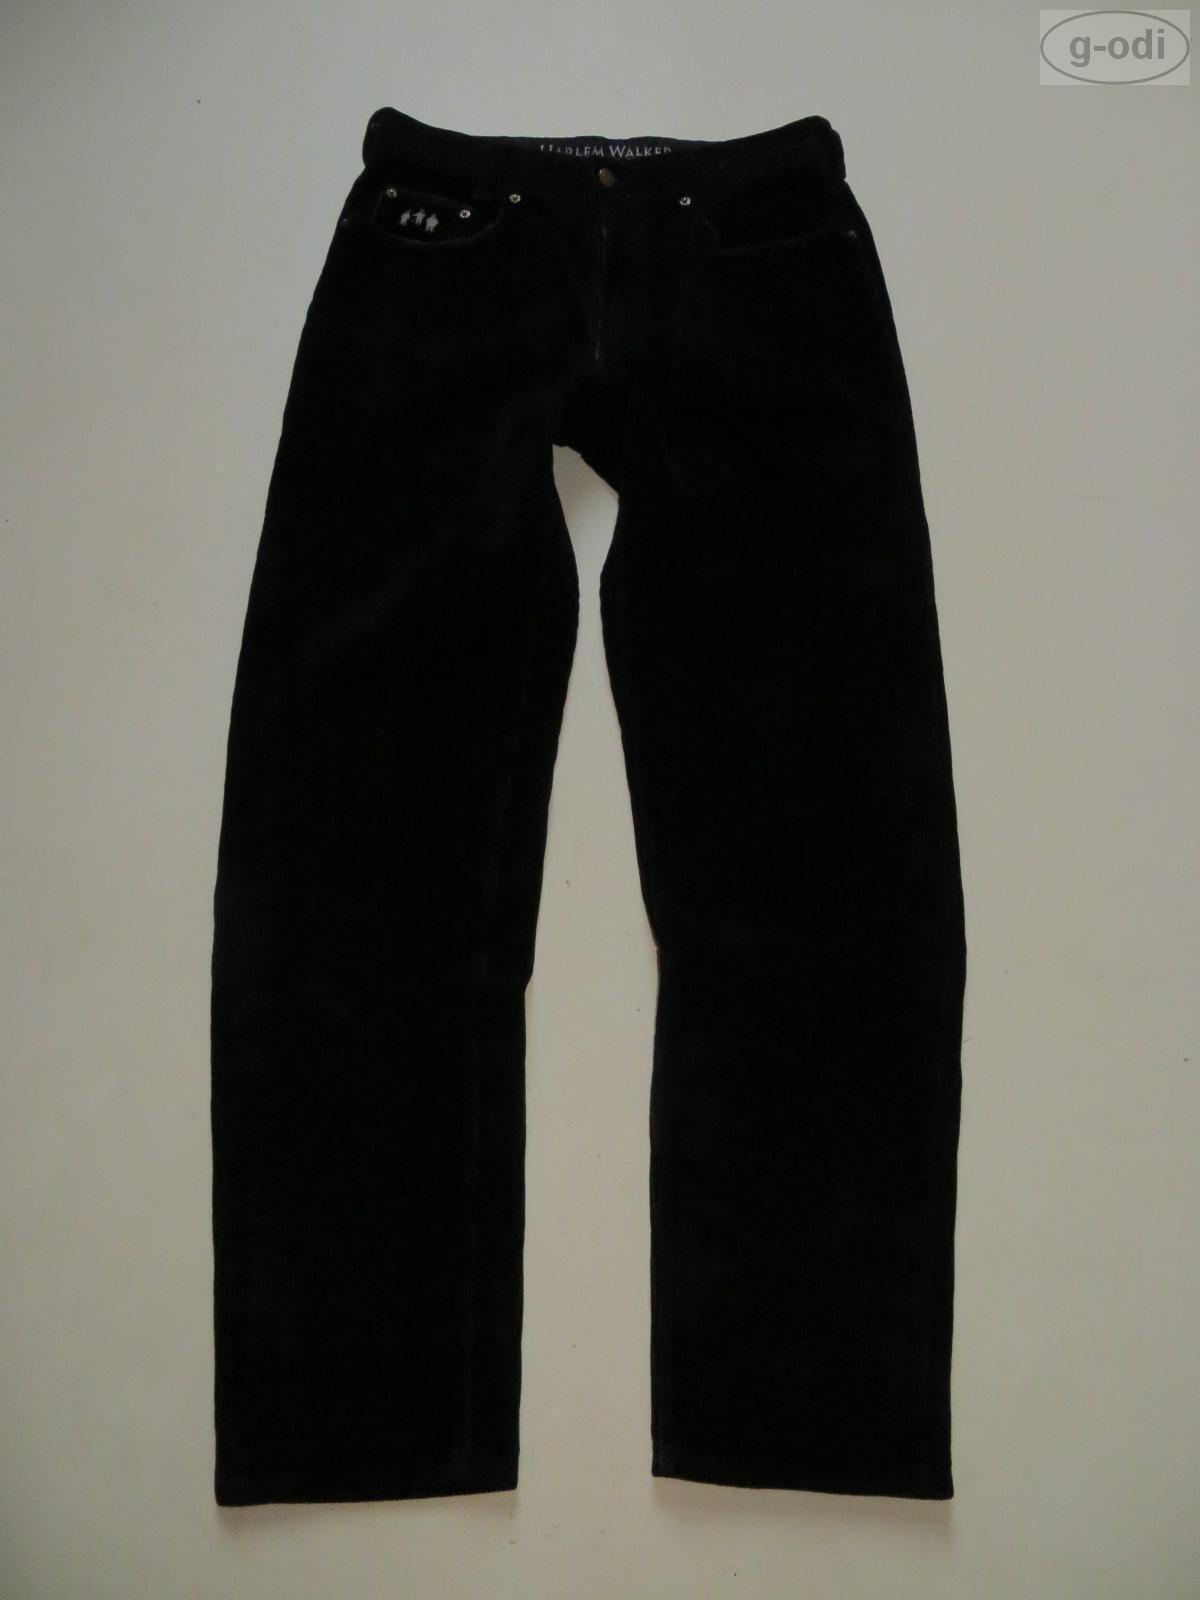 JOKER Jeans Harlem Walker Cordhose W 33  L 34 Schwarz Hochwertig & Robust RAR